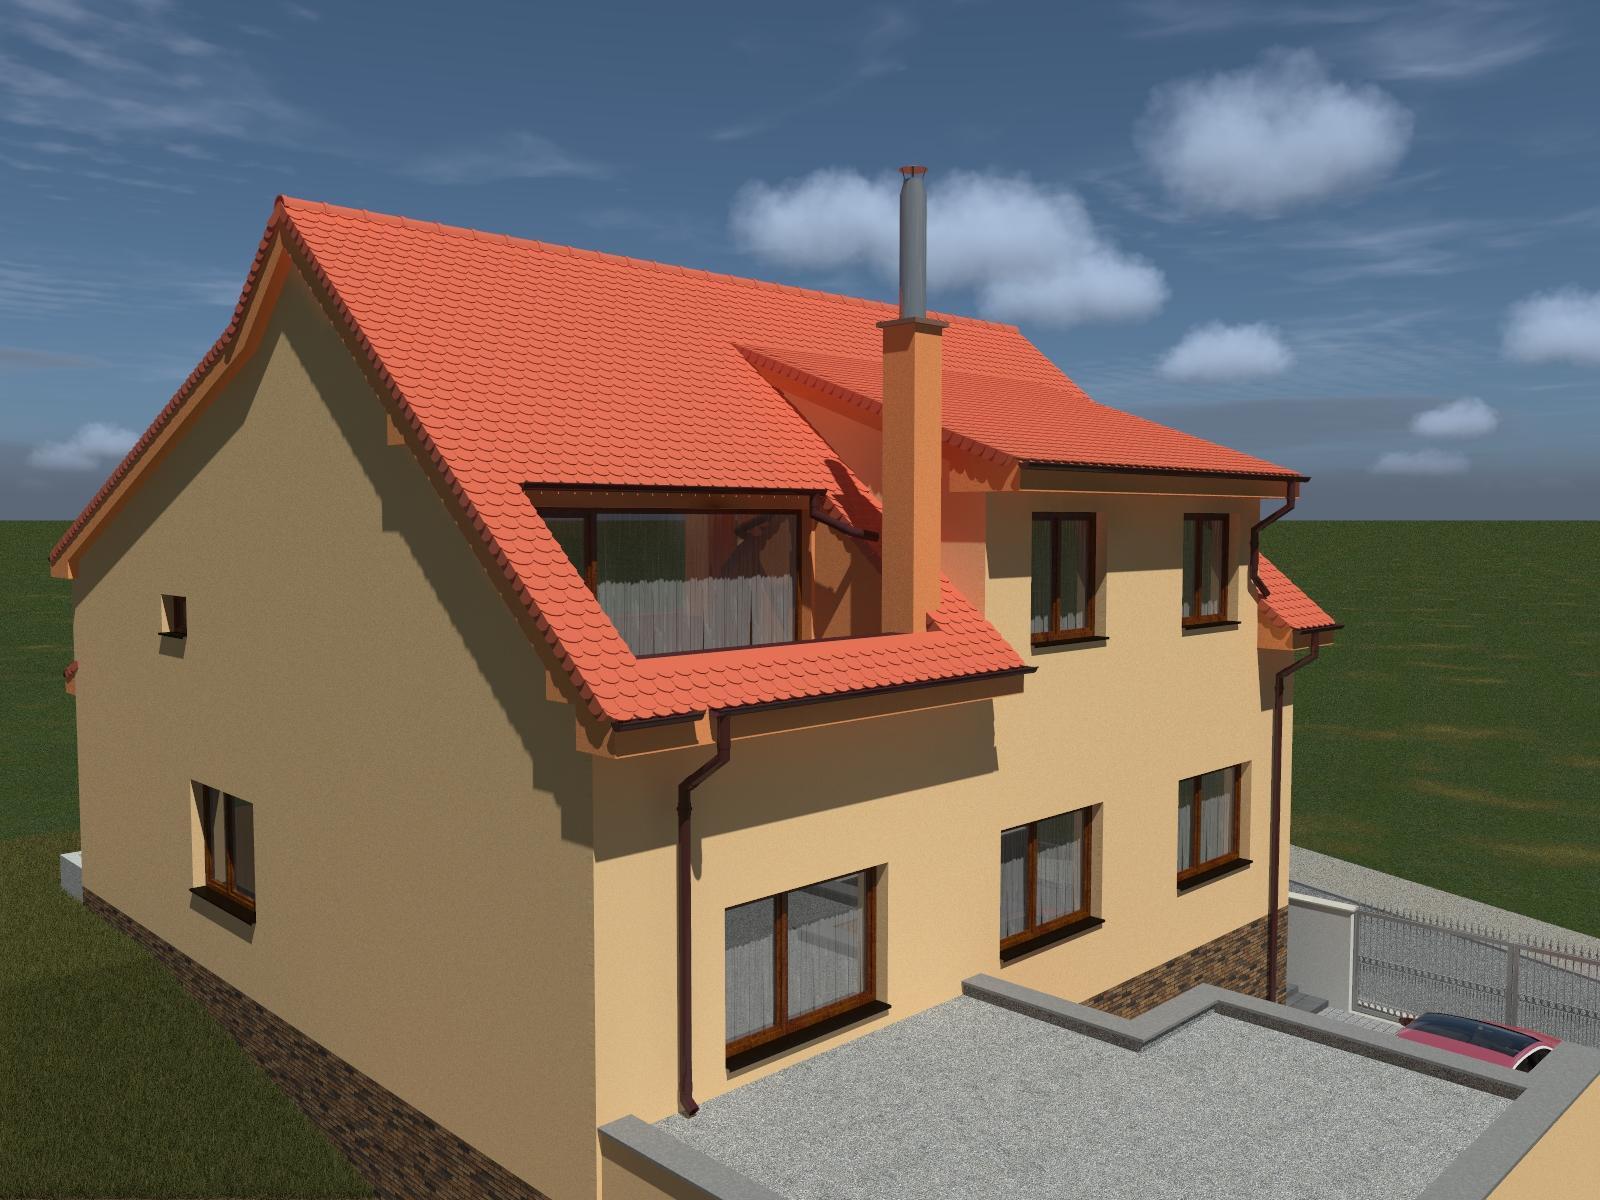 Prestavba podkrovia zo sedlovo valbovej na sedlovú strechu. - Obrázok č. 11